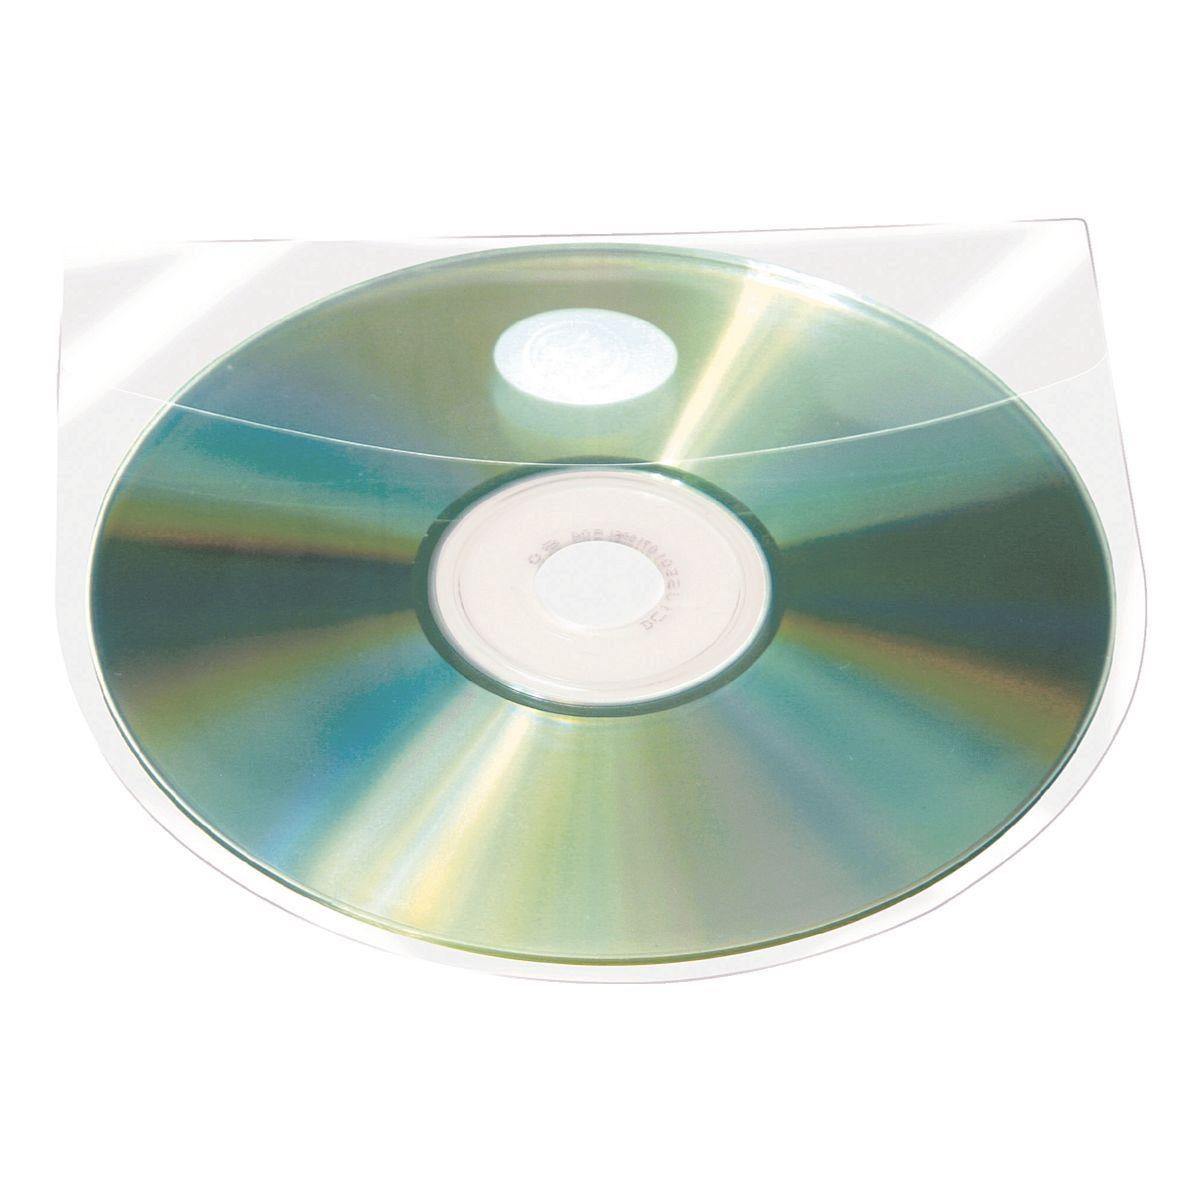 PROBECO 100 Selbstklebende CD/DVD/Blu-ray-Hüllen mit Selbstklebe...